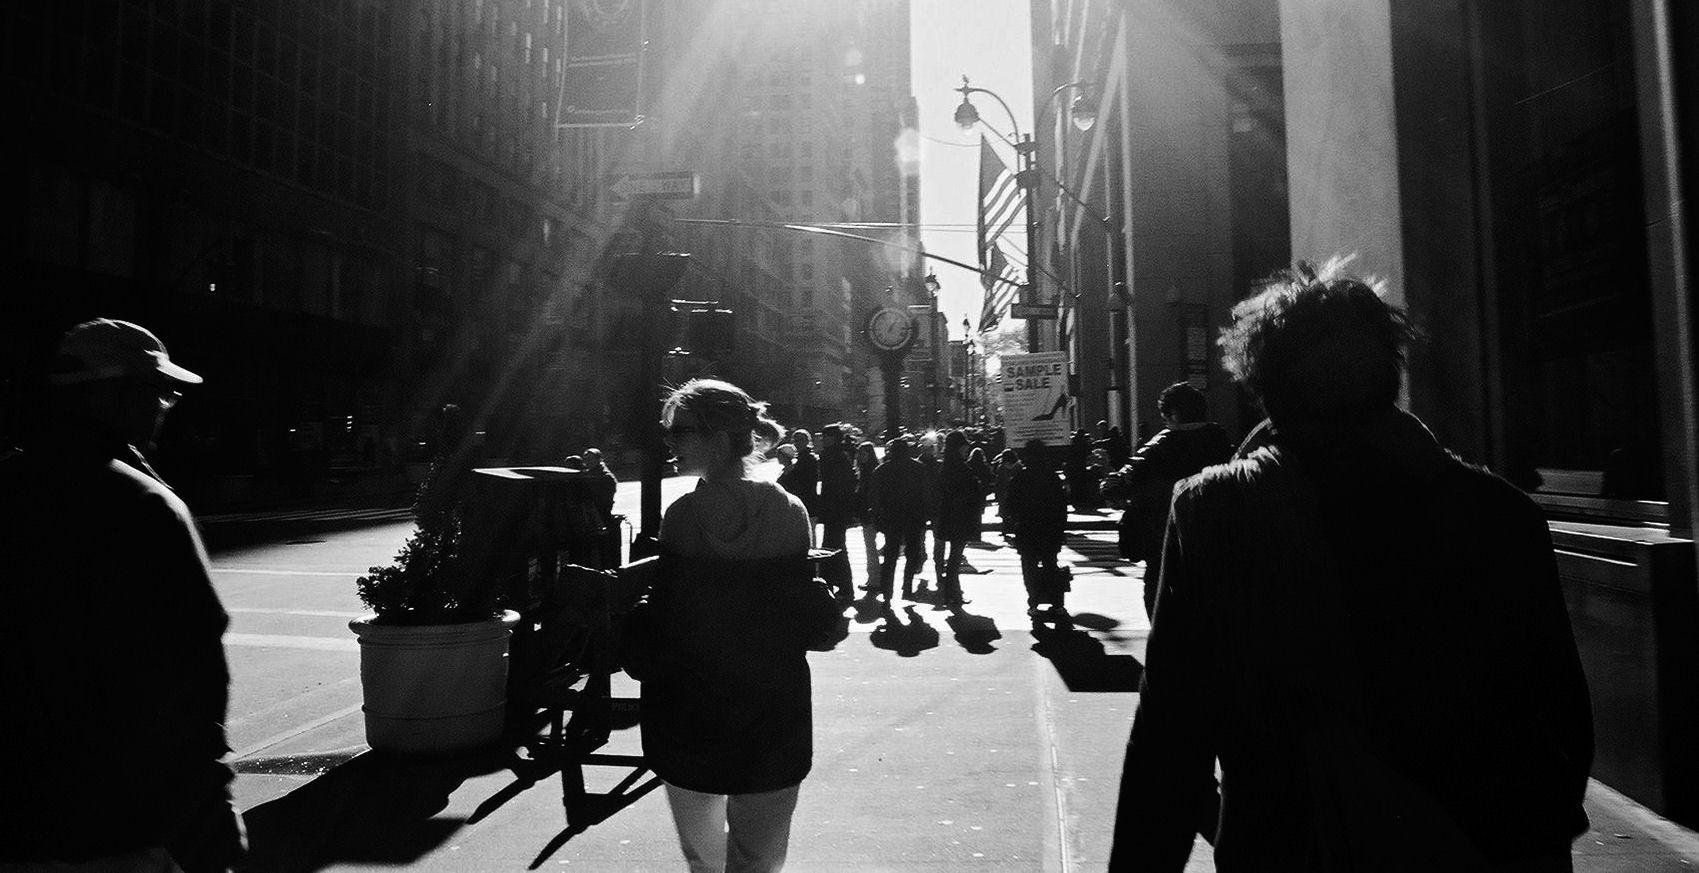 New York City street, by Olivier Blanchard 2005